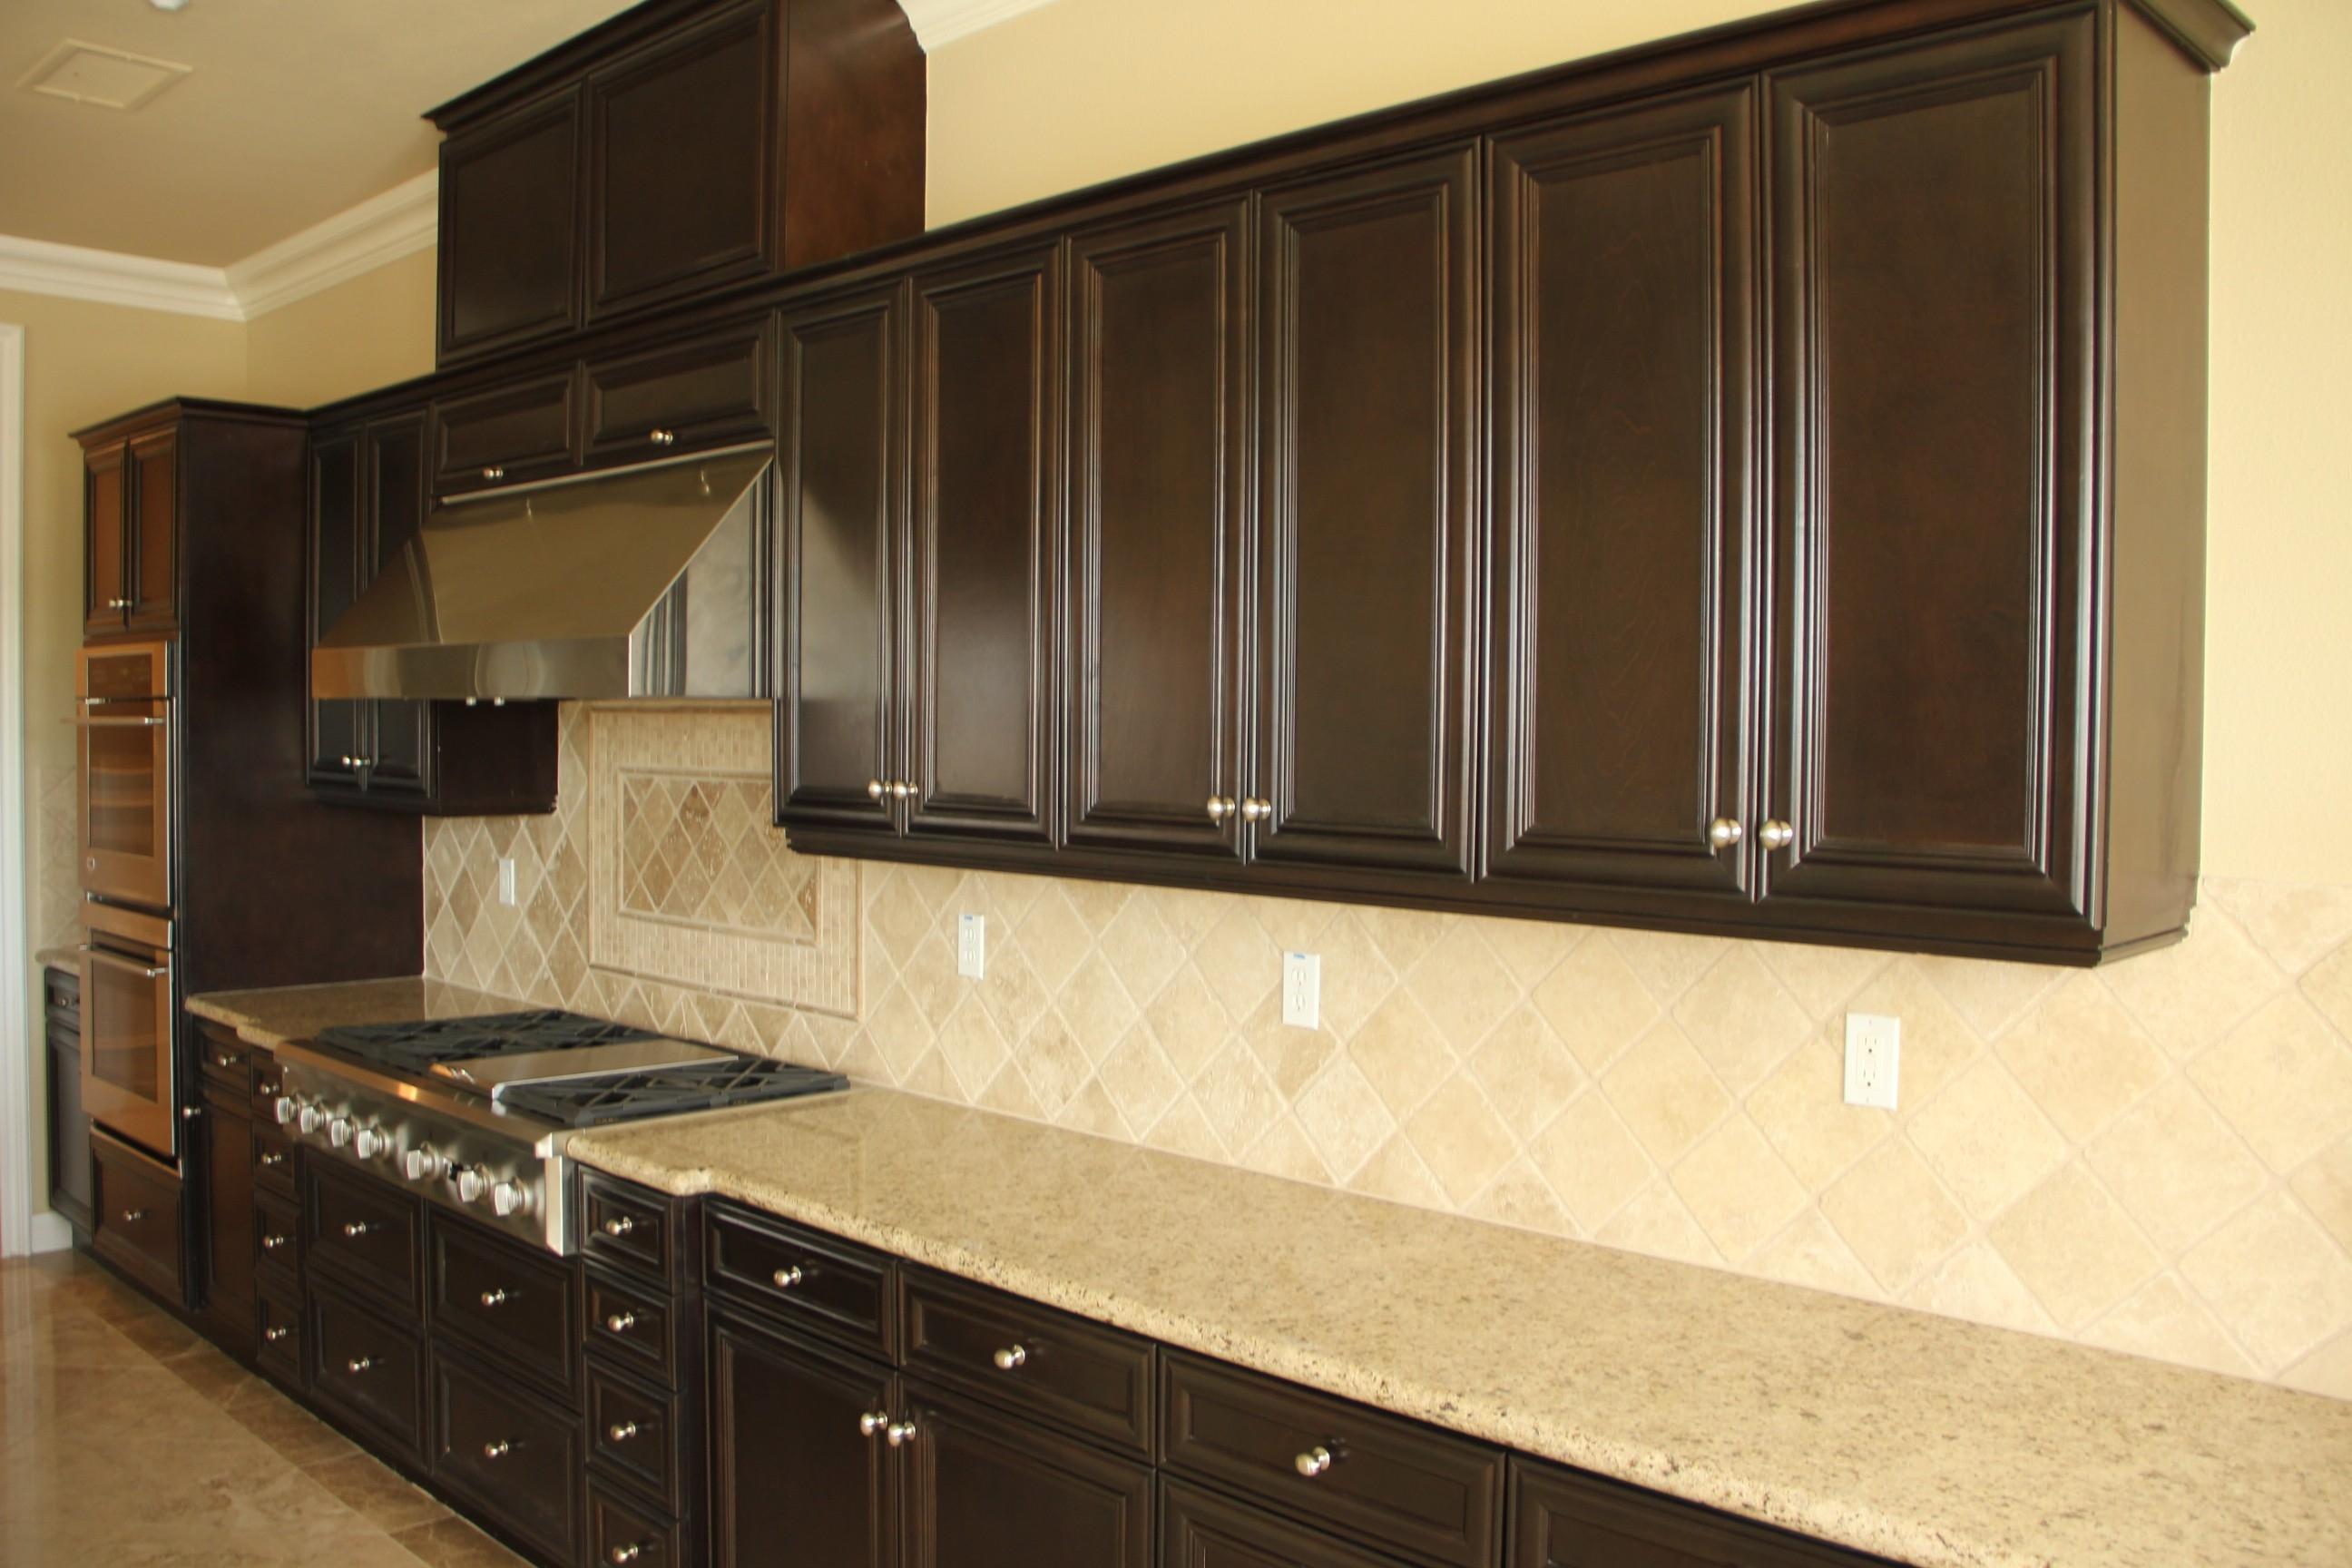 door knobs kitchen cabinets photo - 13